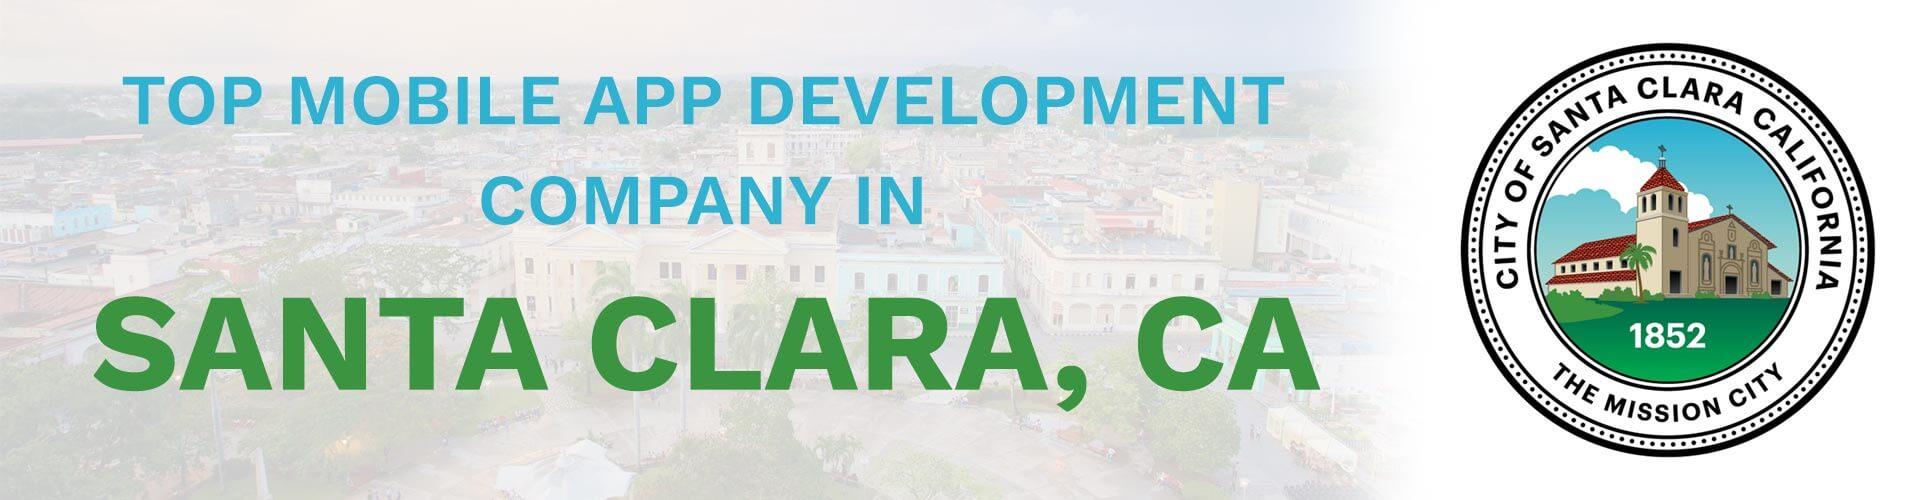 mobile app development company santa clara